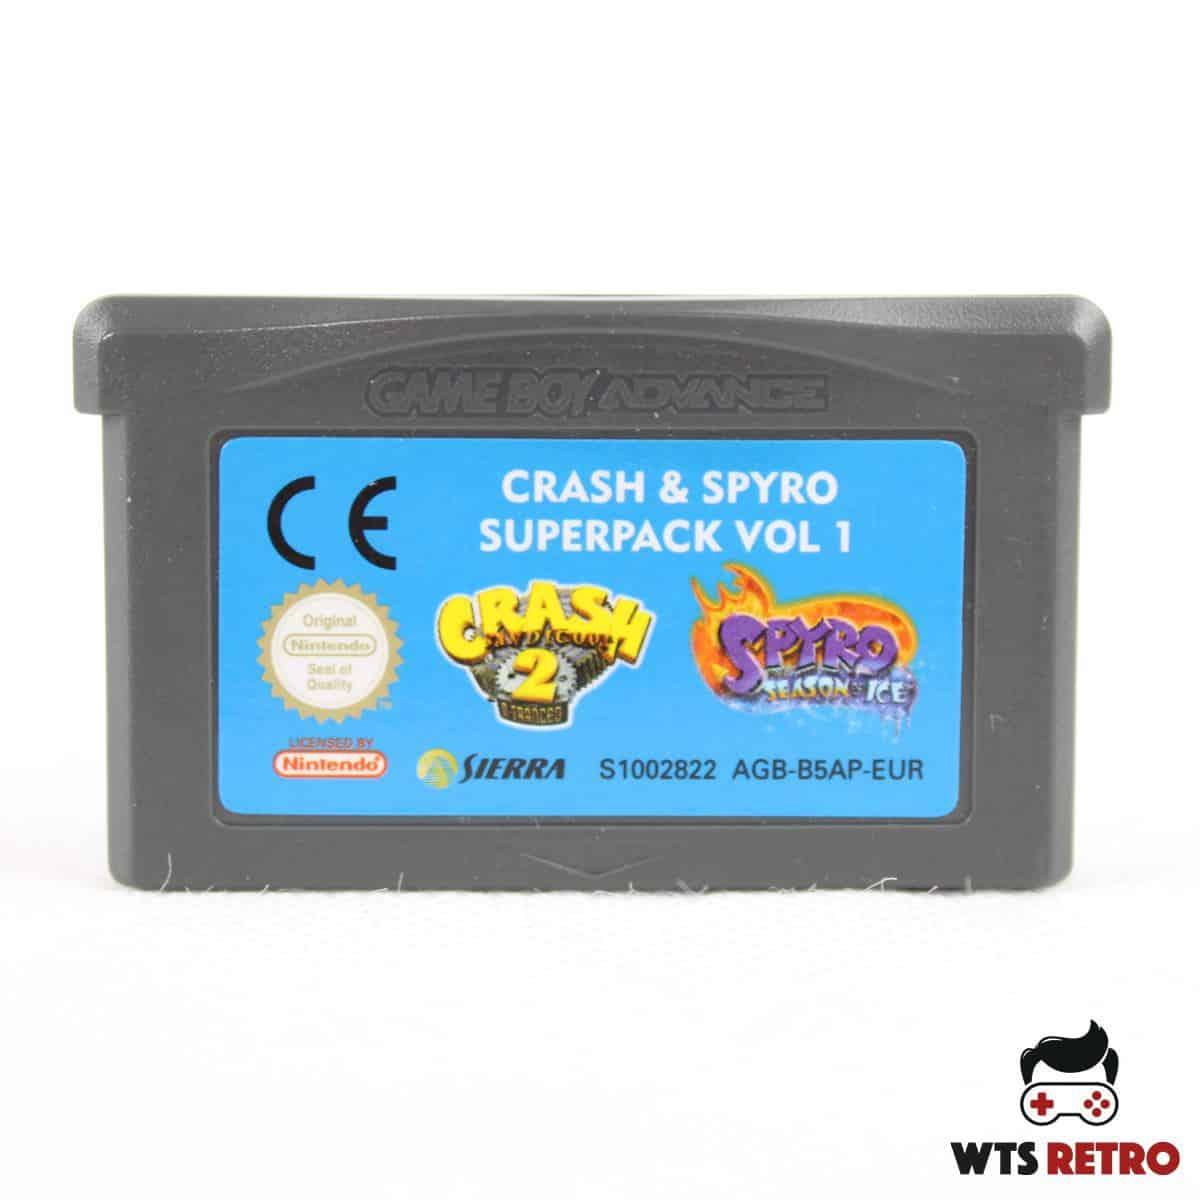 Crash & Spyro Superpack Vol. 1 (Game Boy Advance - GBA)